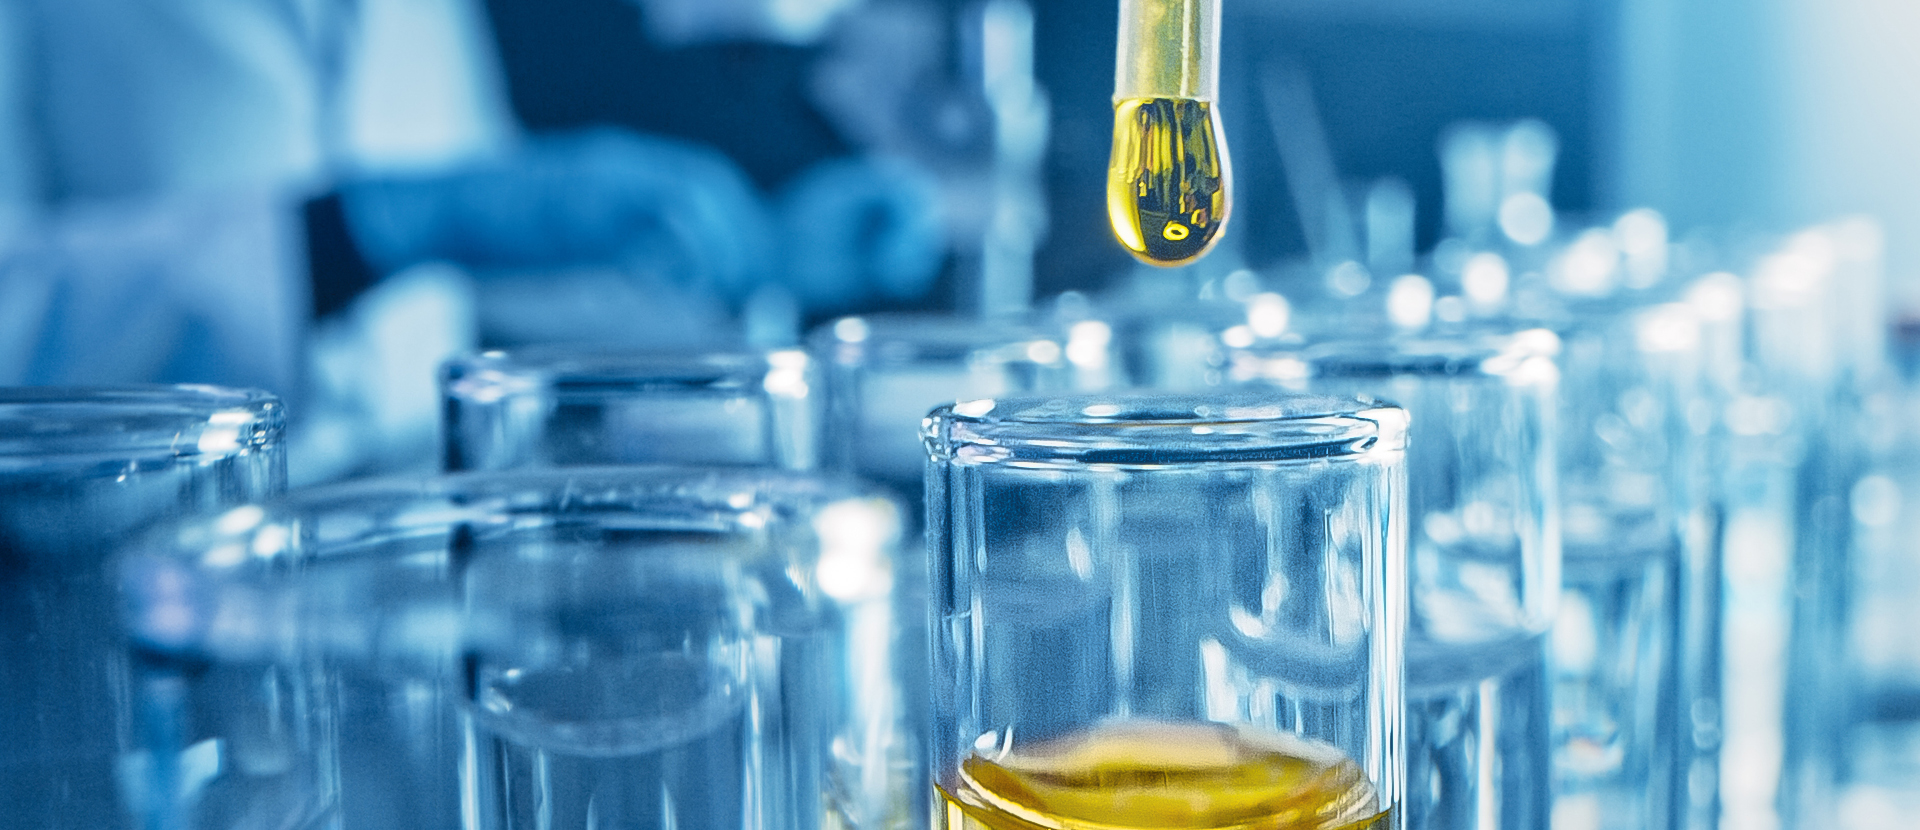 cbd-hemp-laboratory-tests-and-extraction-swiss-cristal-lab-slider-1